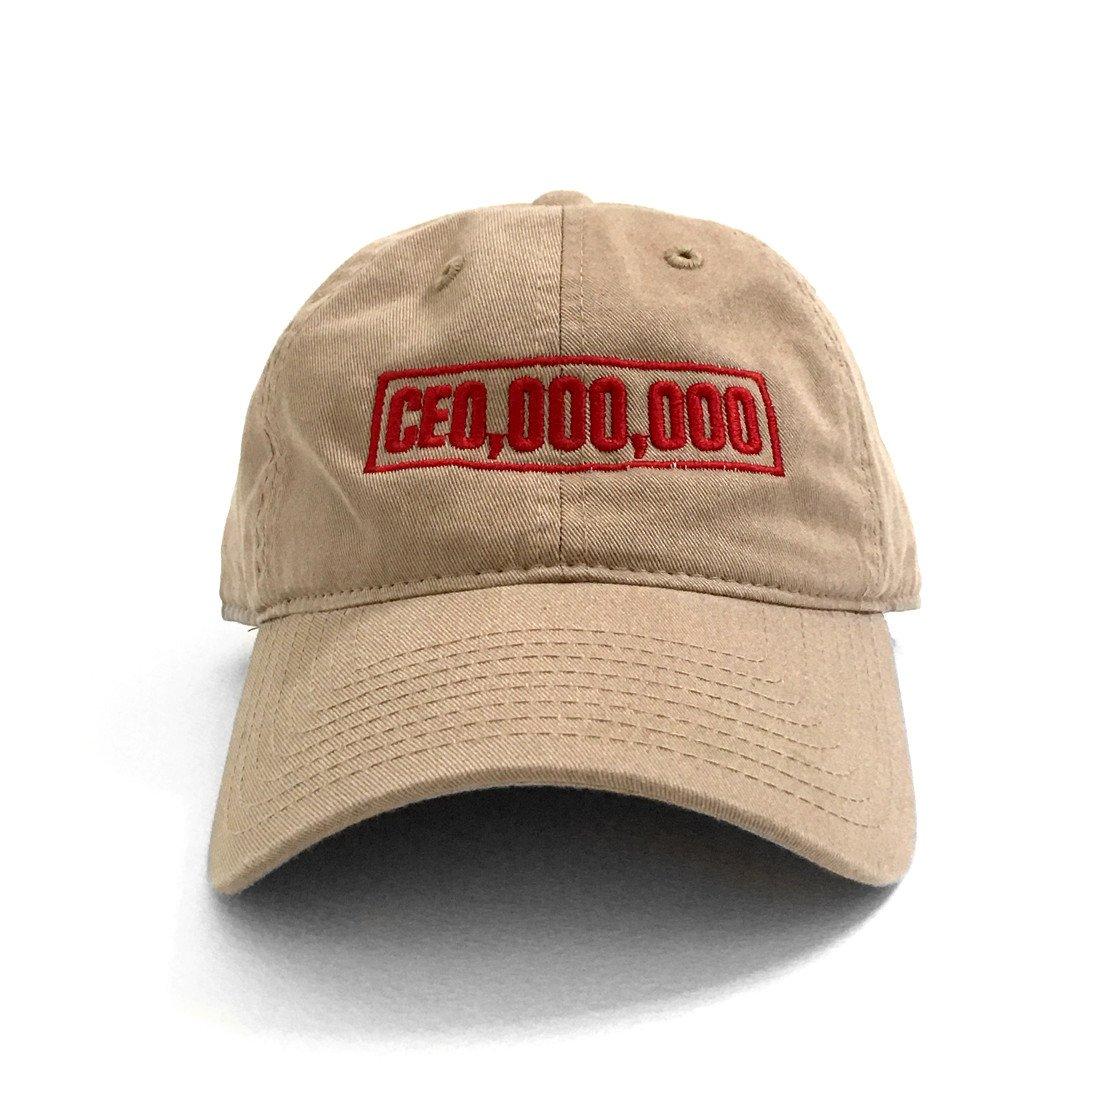 $CE0,000,000 Box Dad Hat [Khaki]